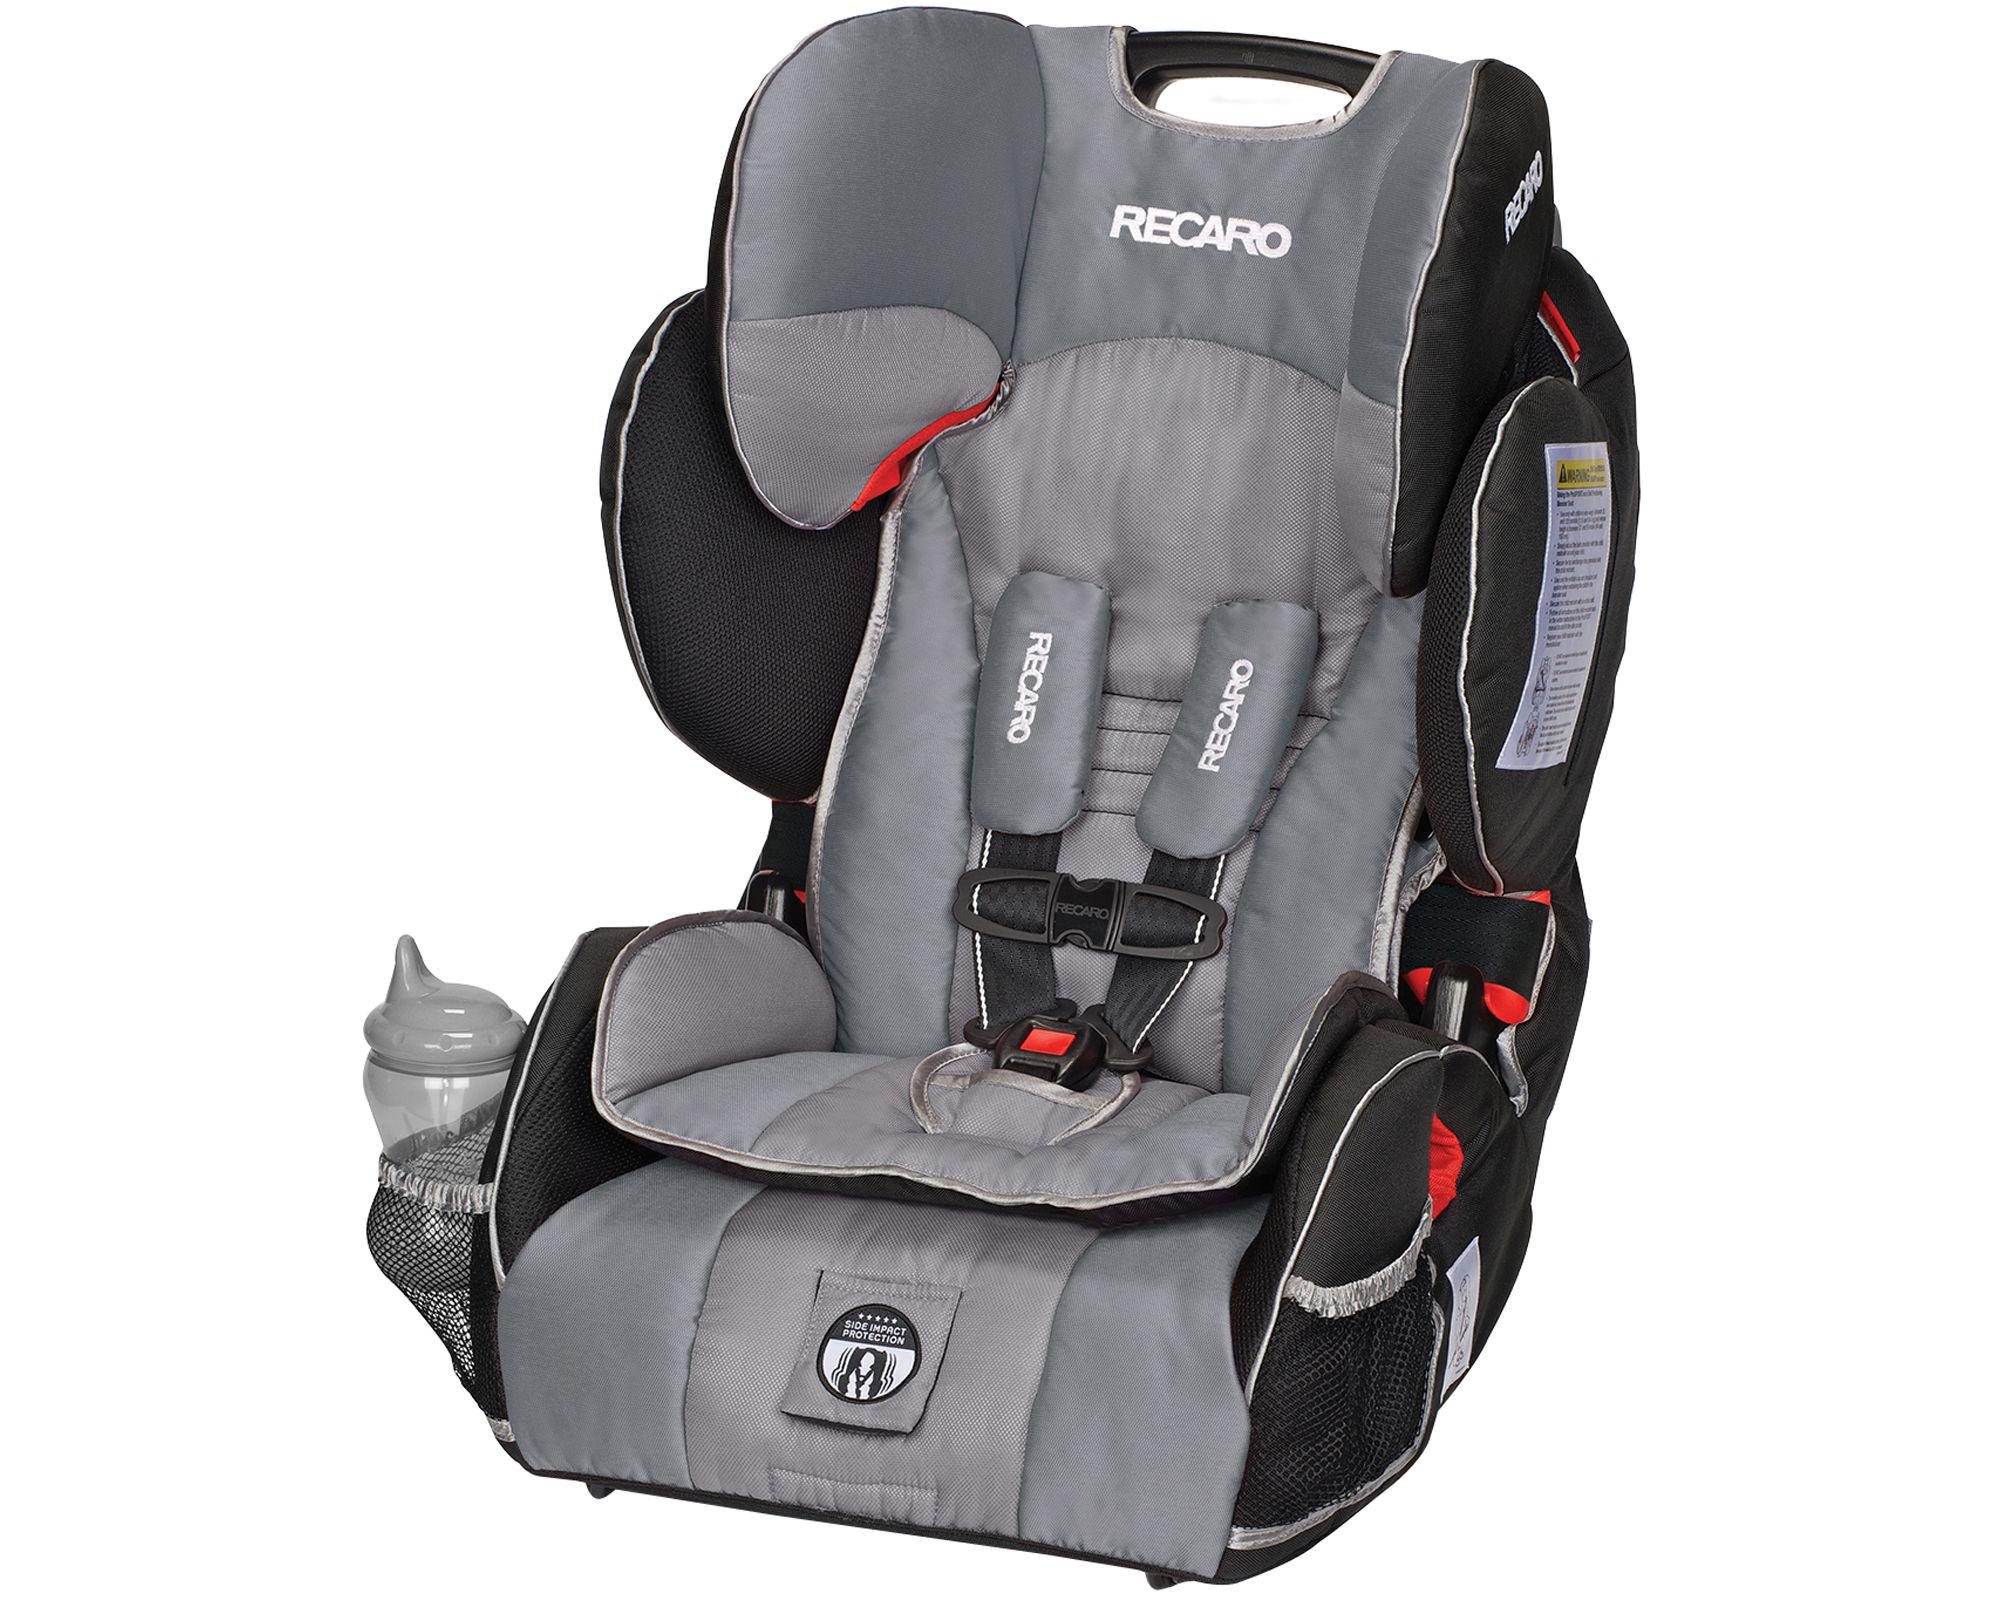 Recaro Performance Sport Harness Booster Car Seat - Haze